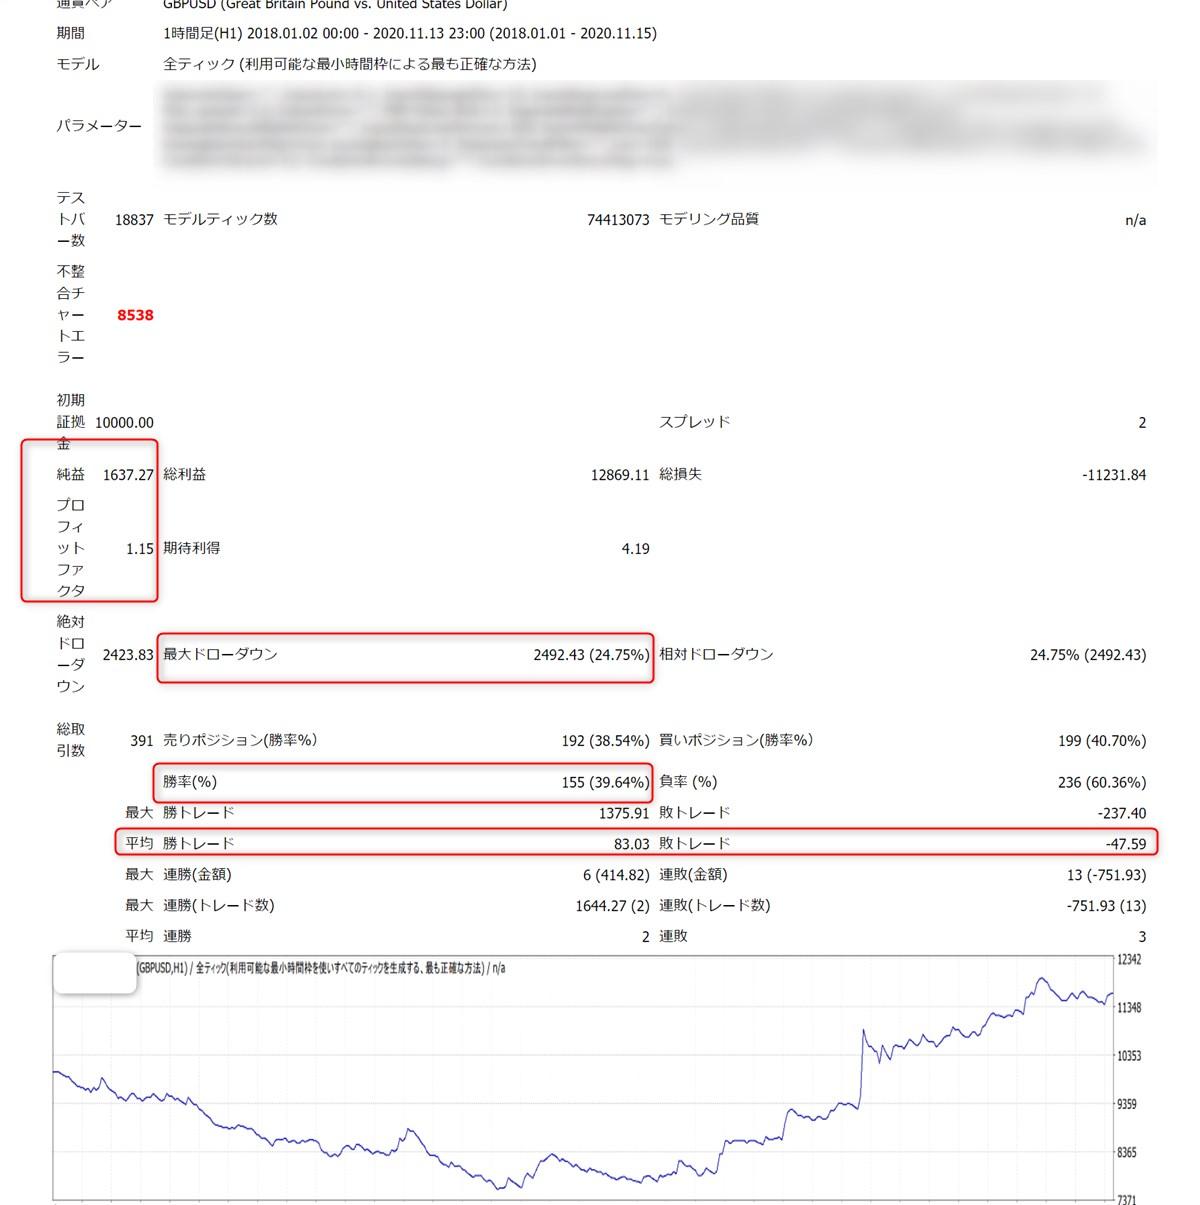 K_SwingTrading_Tool:2018~2020年のバックテスト結果・GBPUSD